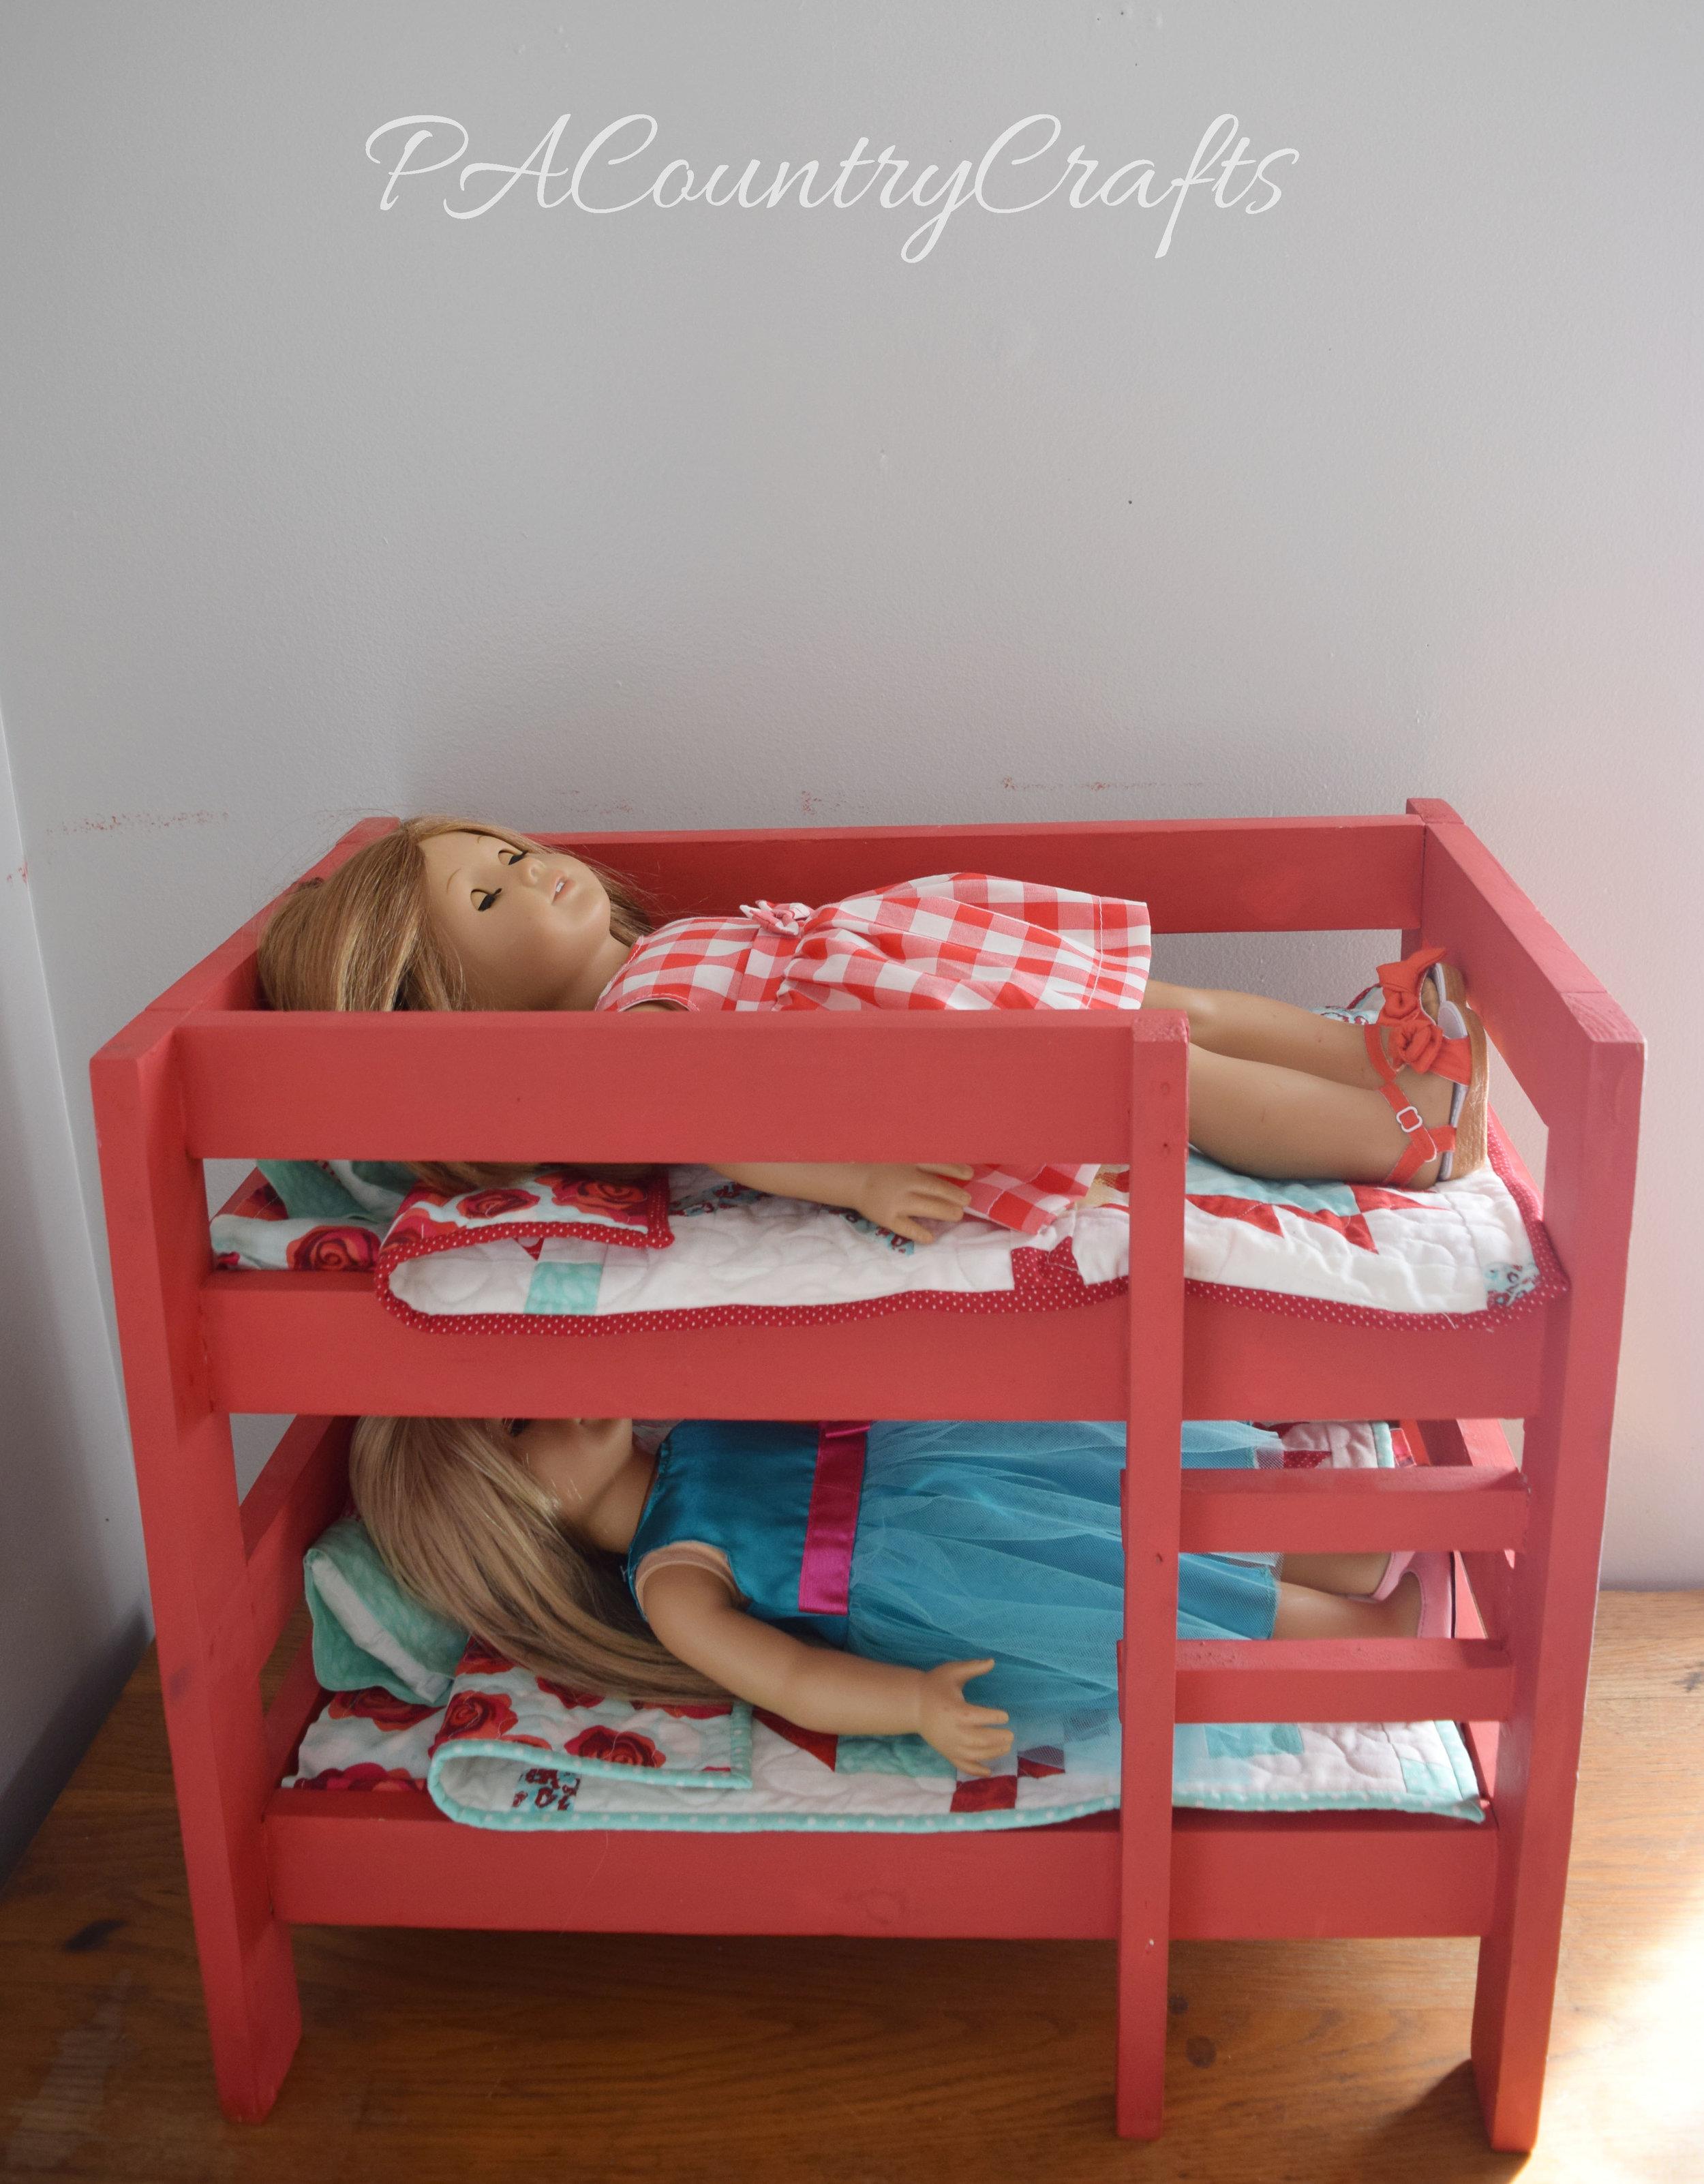 Diy Doll Bunk Beds Pacountrycrafts